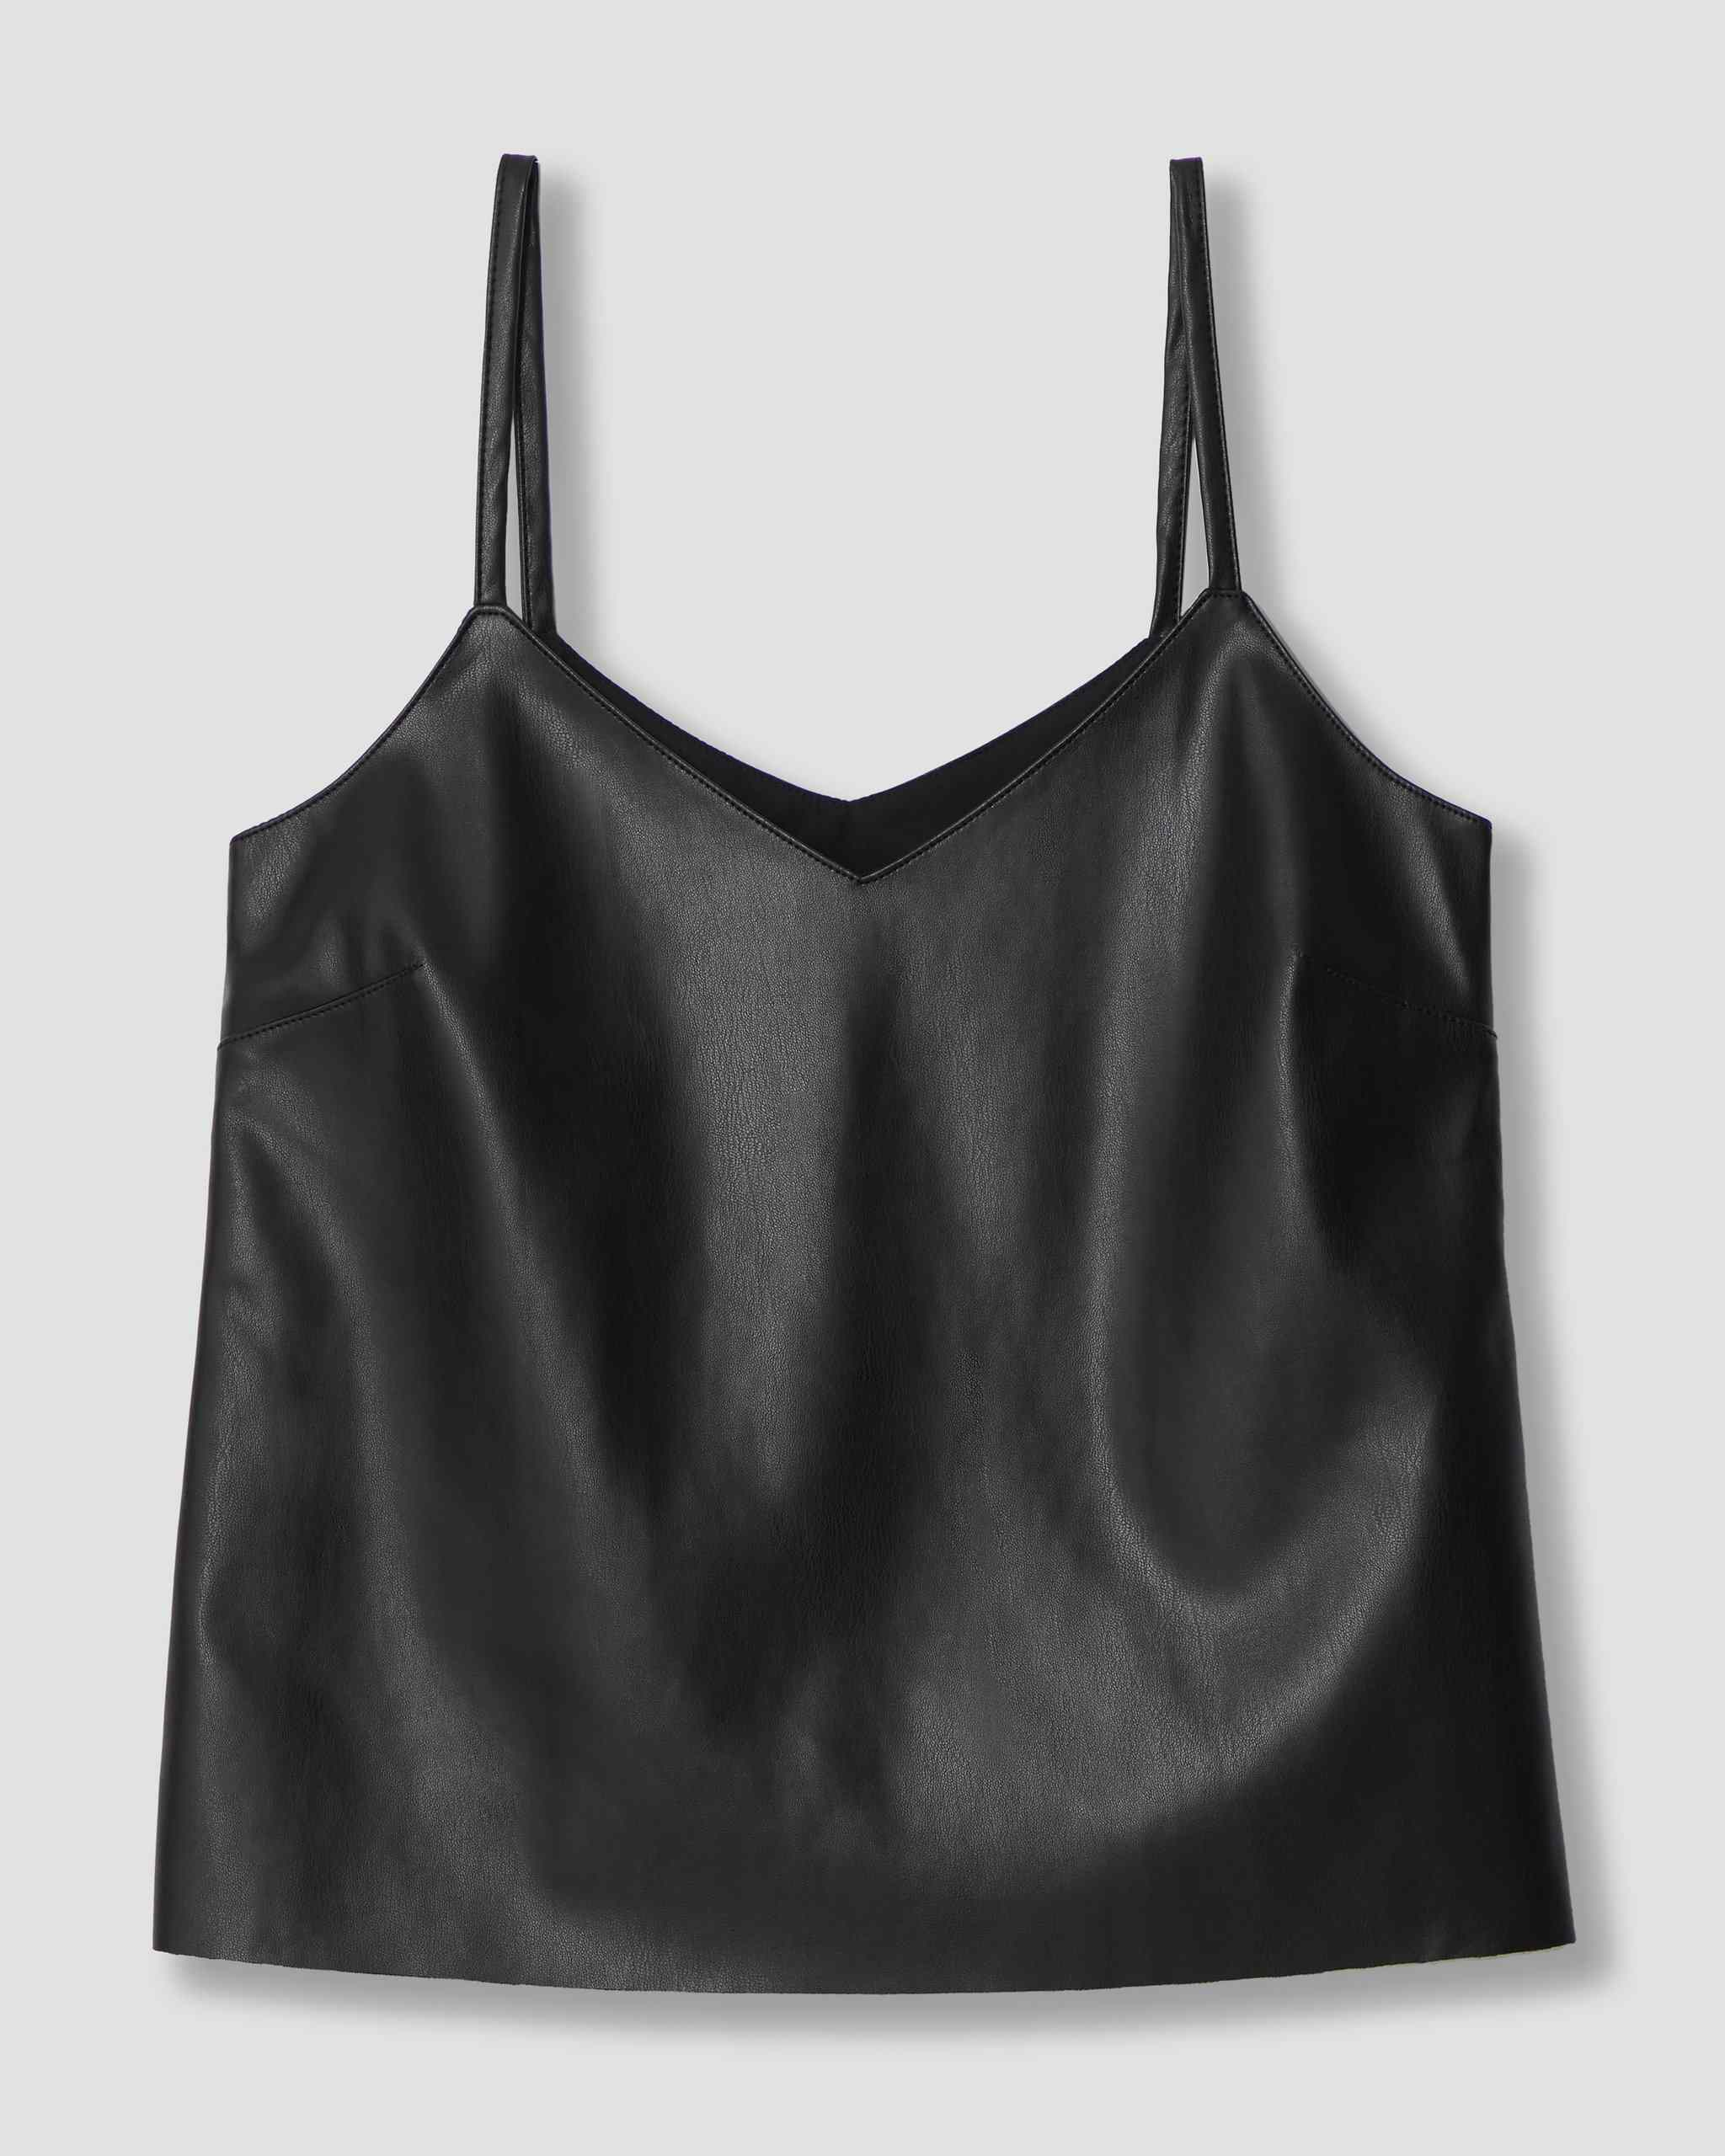 Universal Standard Fatima Vegan Leather Camisole